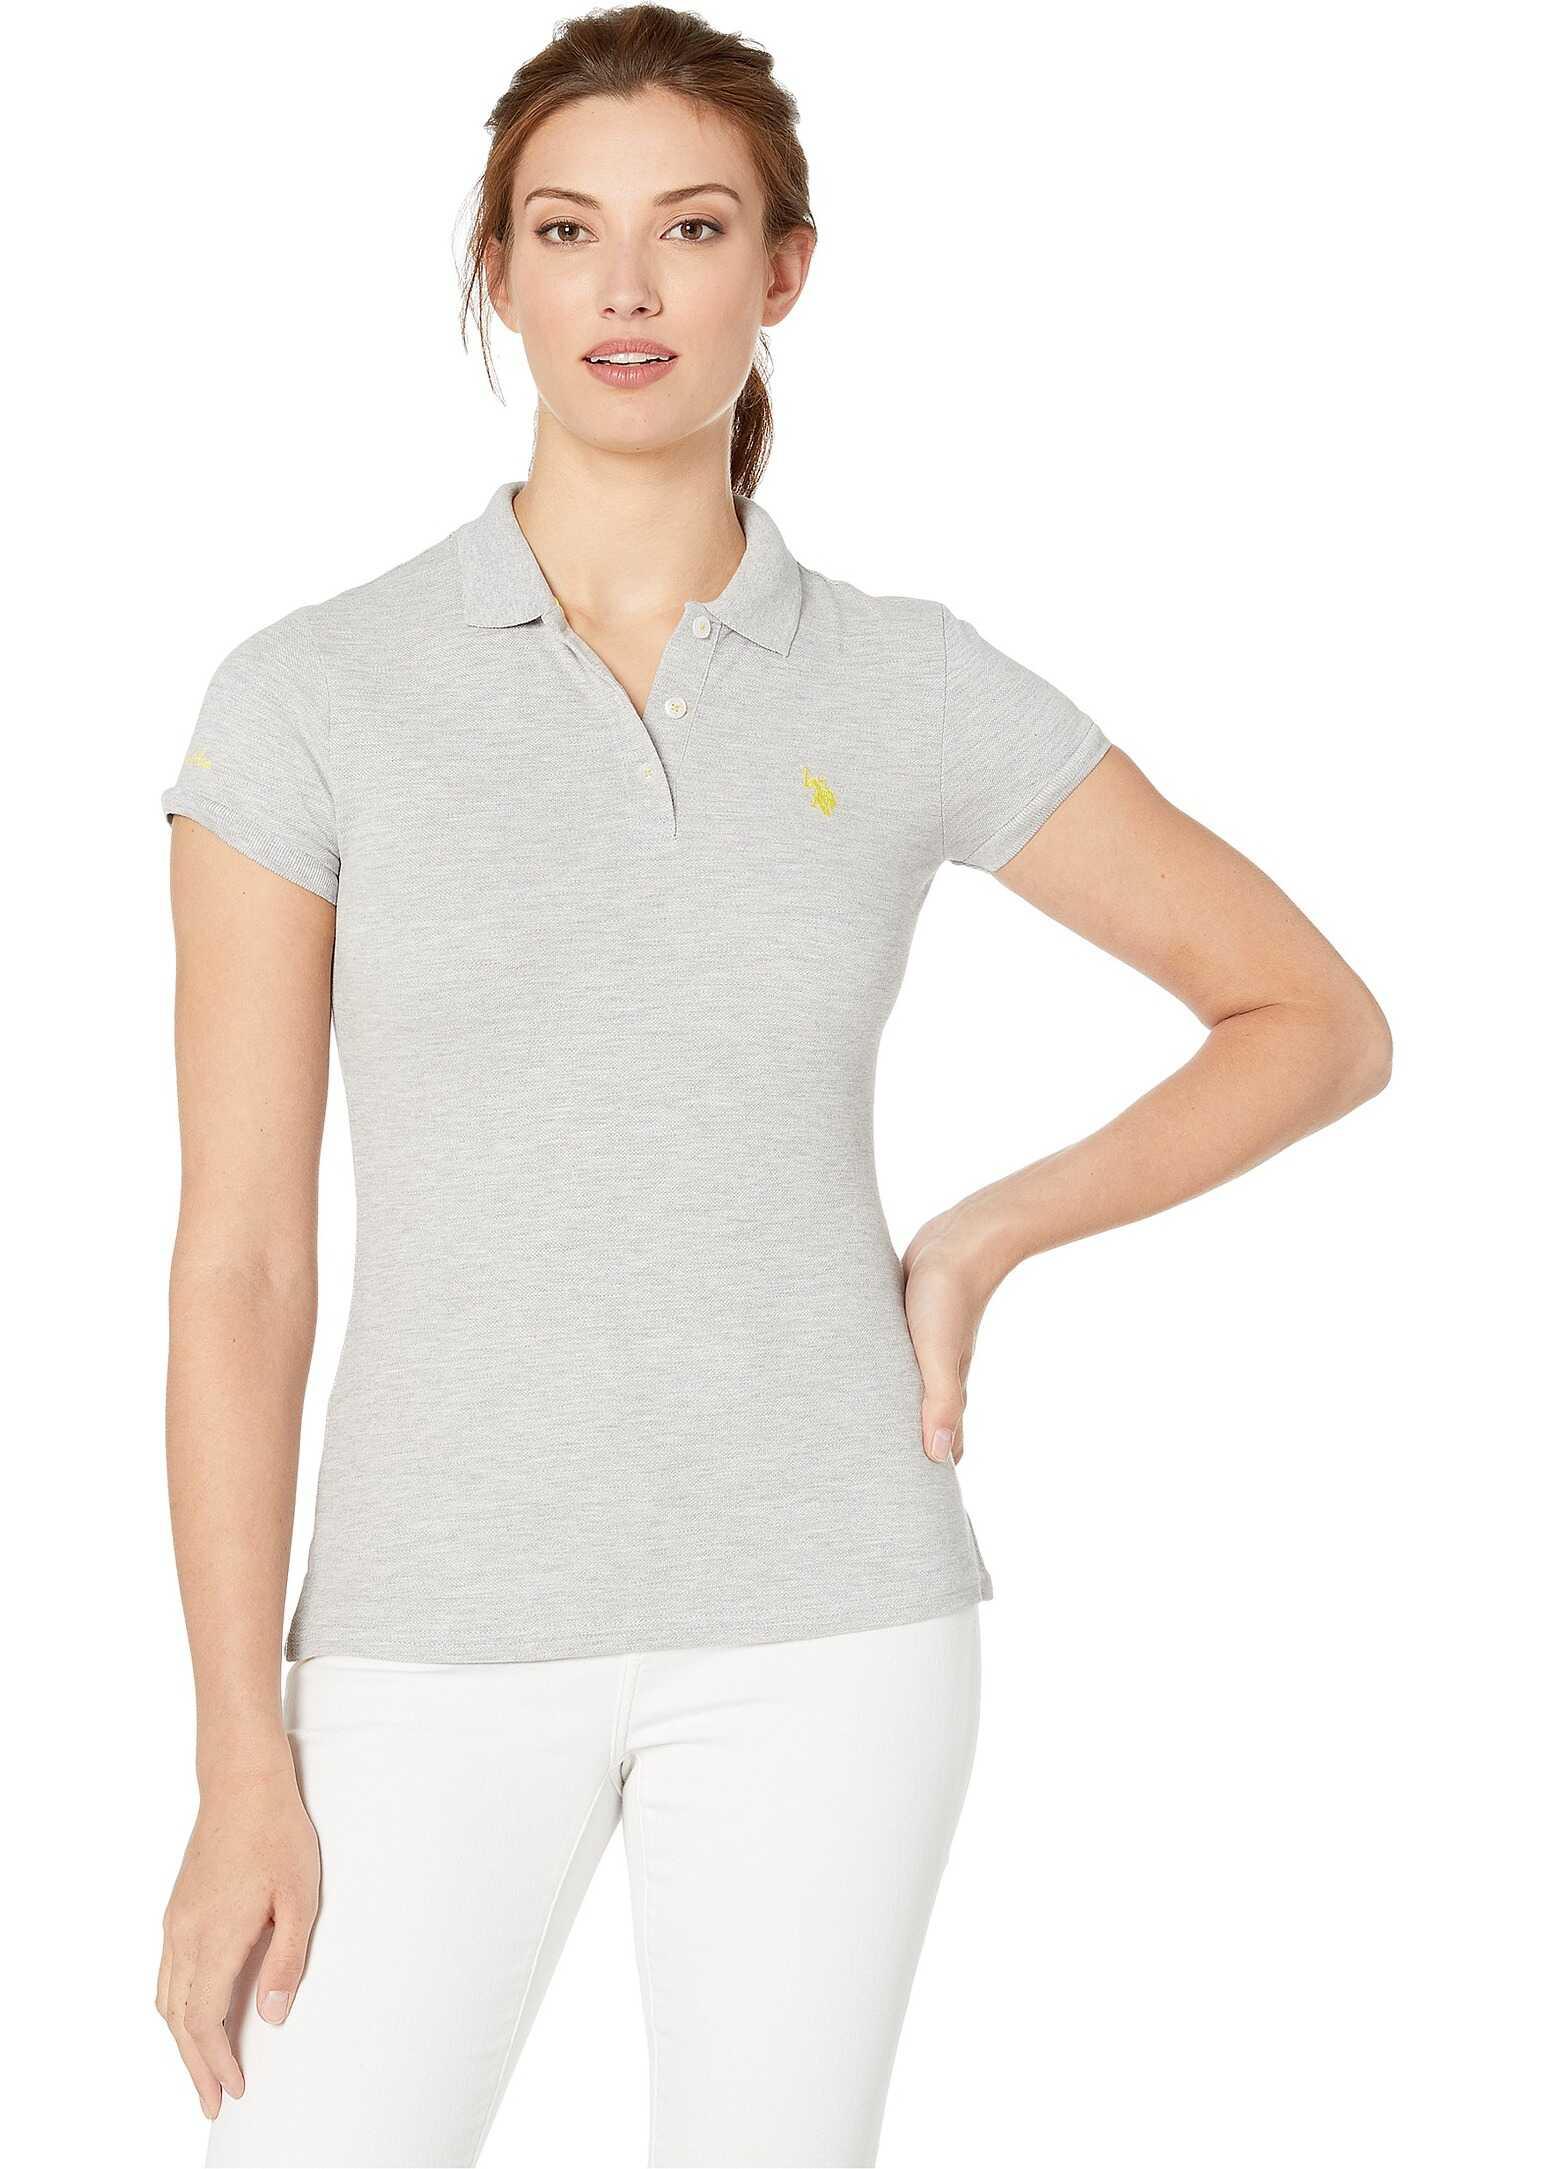 U.S. POLO ASSN. Solid Pique Polo Shirt Light Heather Grey/Sundeck